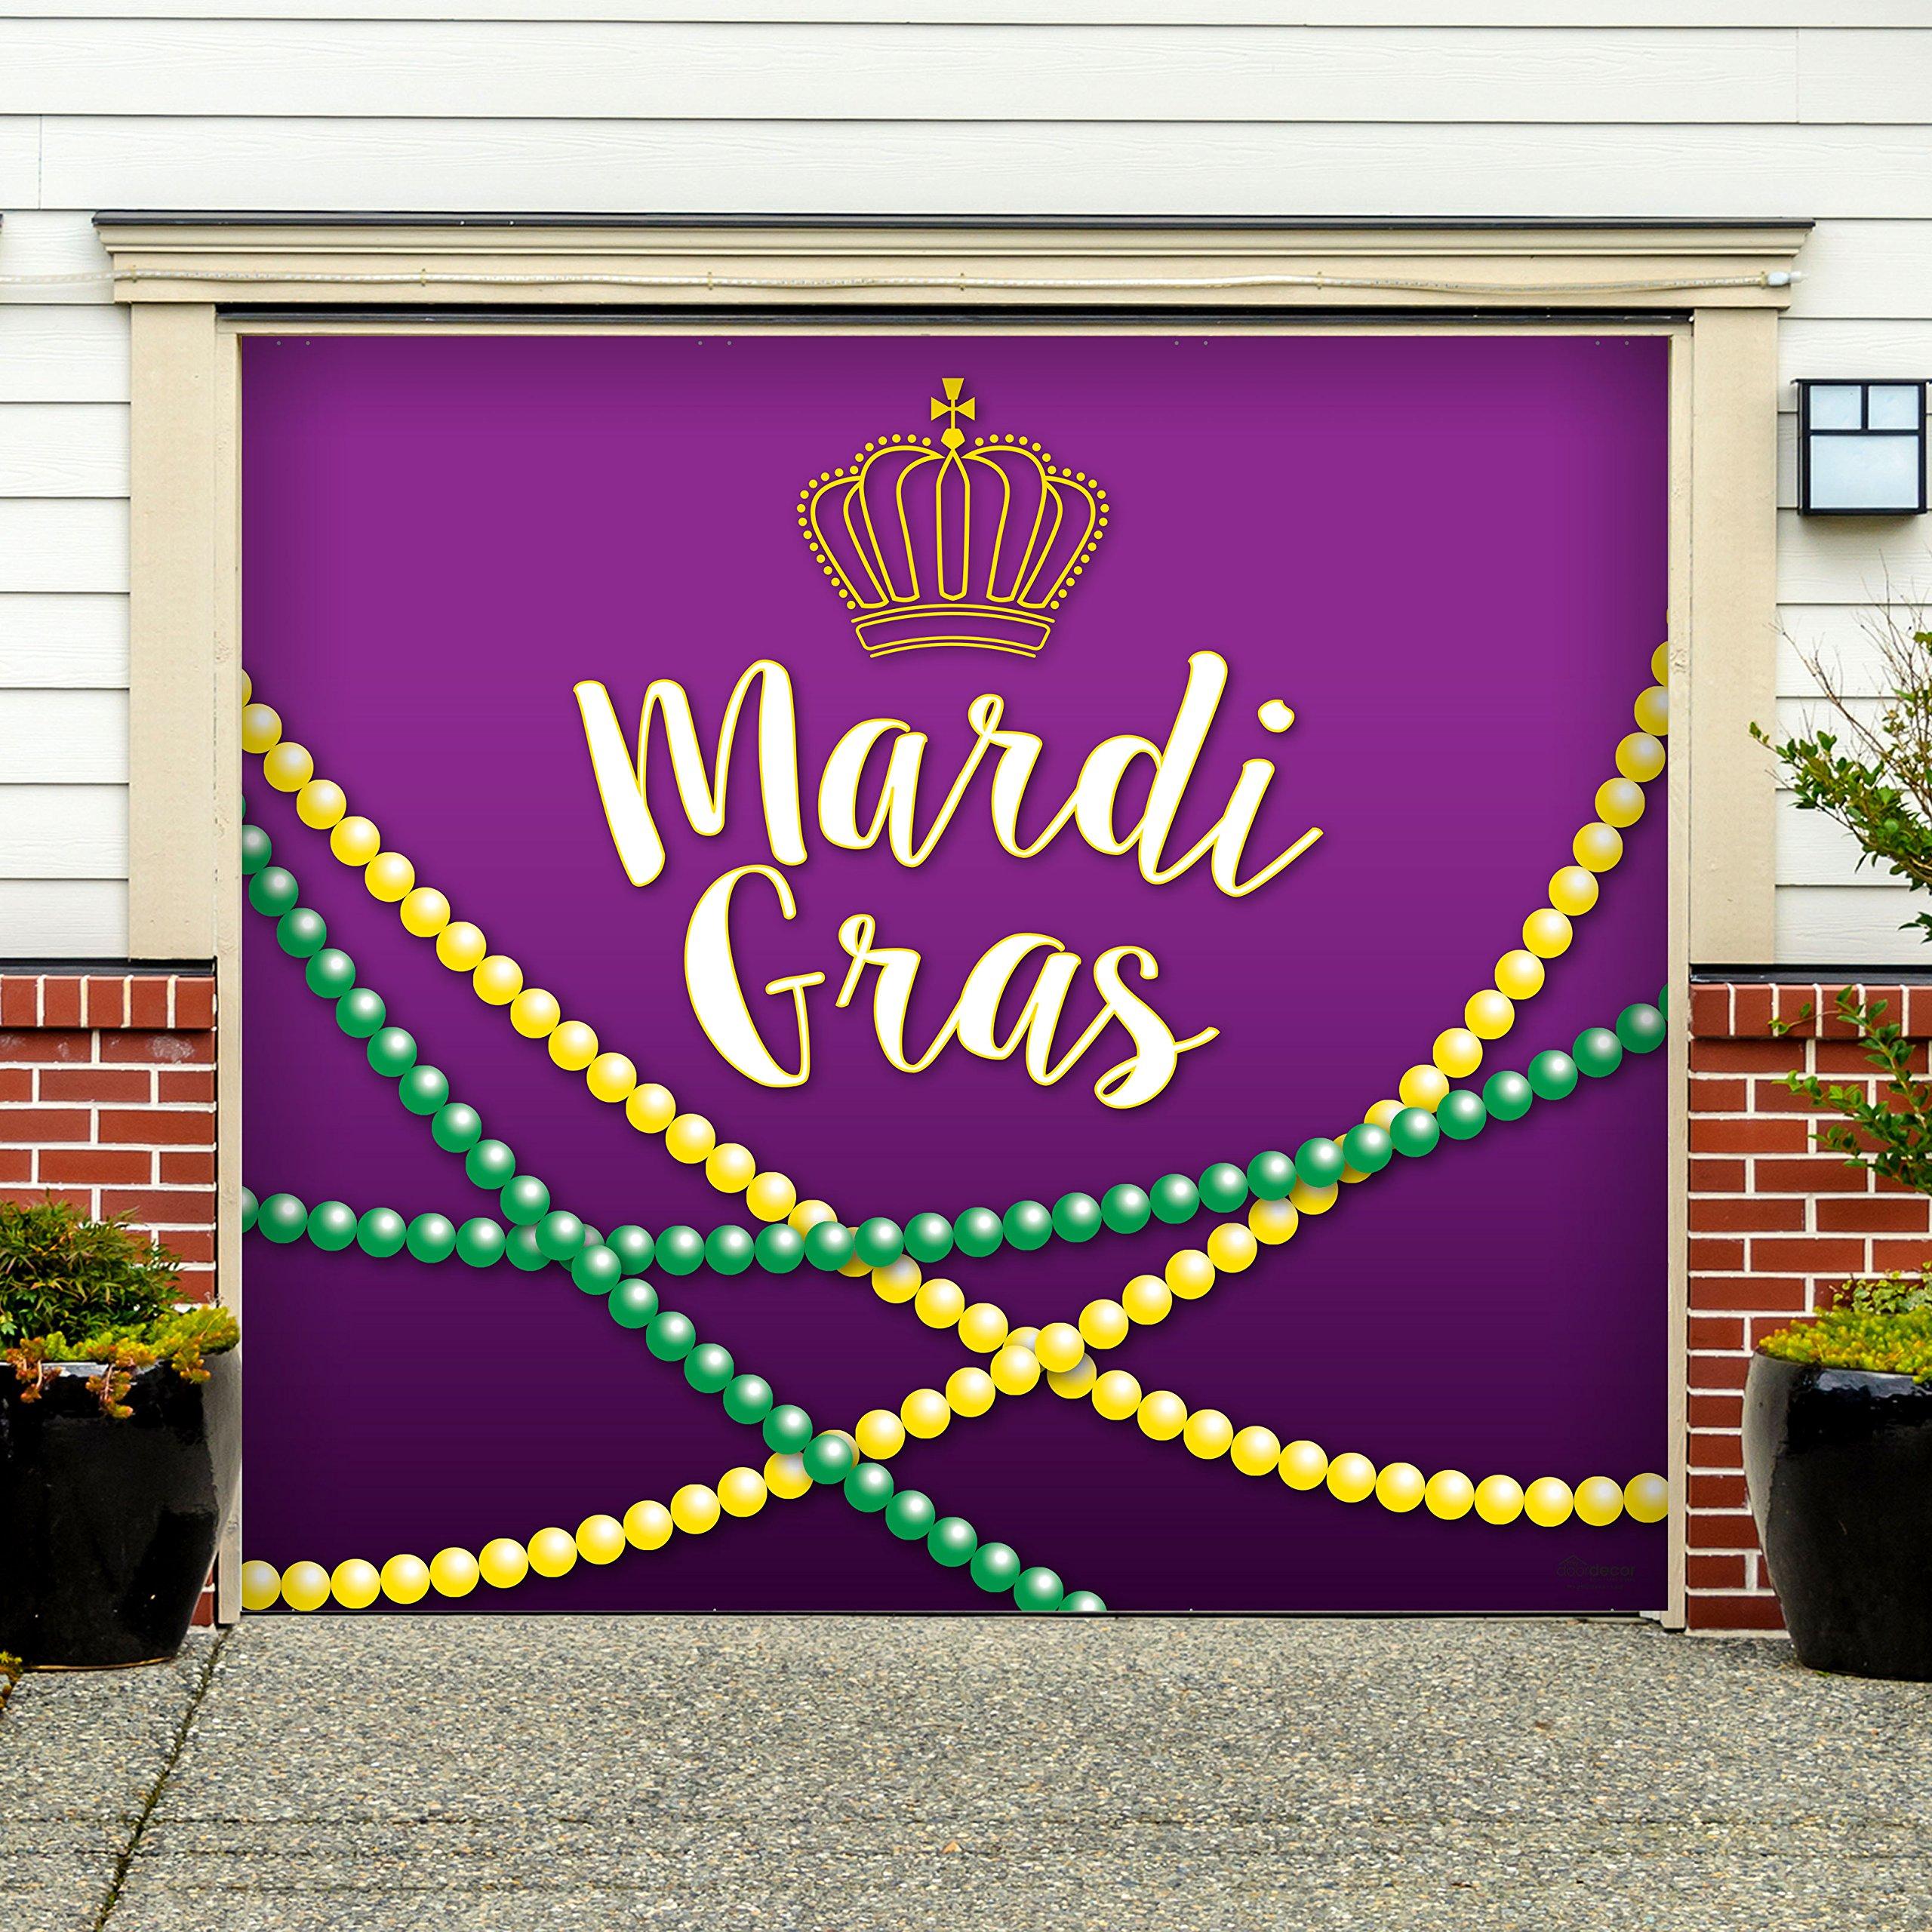 Outdoor Mardi Gras Decorations Garage Door Banner Cover Mural Décoration 7'x8' - Mardi Gras Beads - ''The Original Mardi Gras Supplies Holiday Garage Door Banner Decor'' by Victory Corps